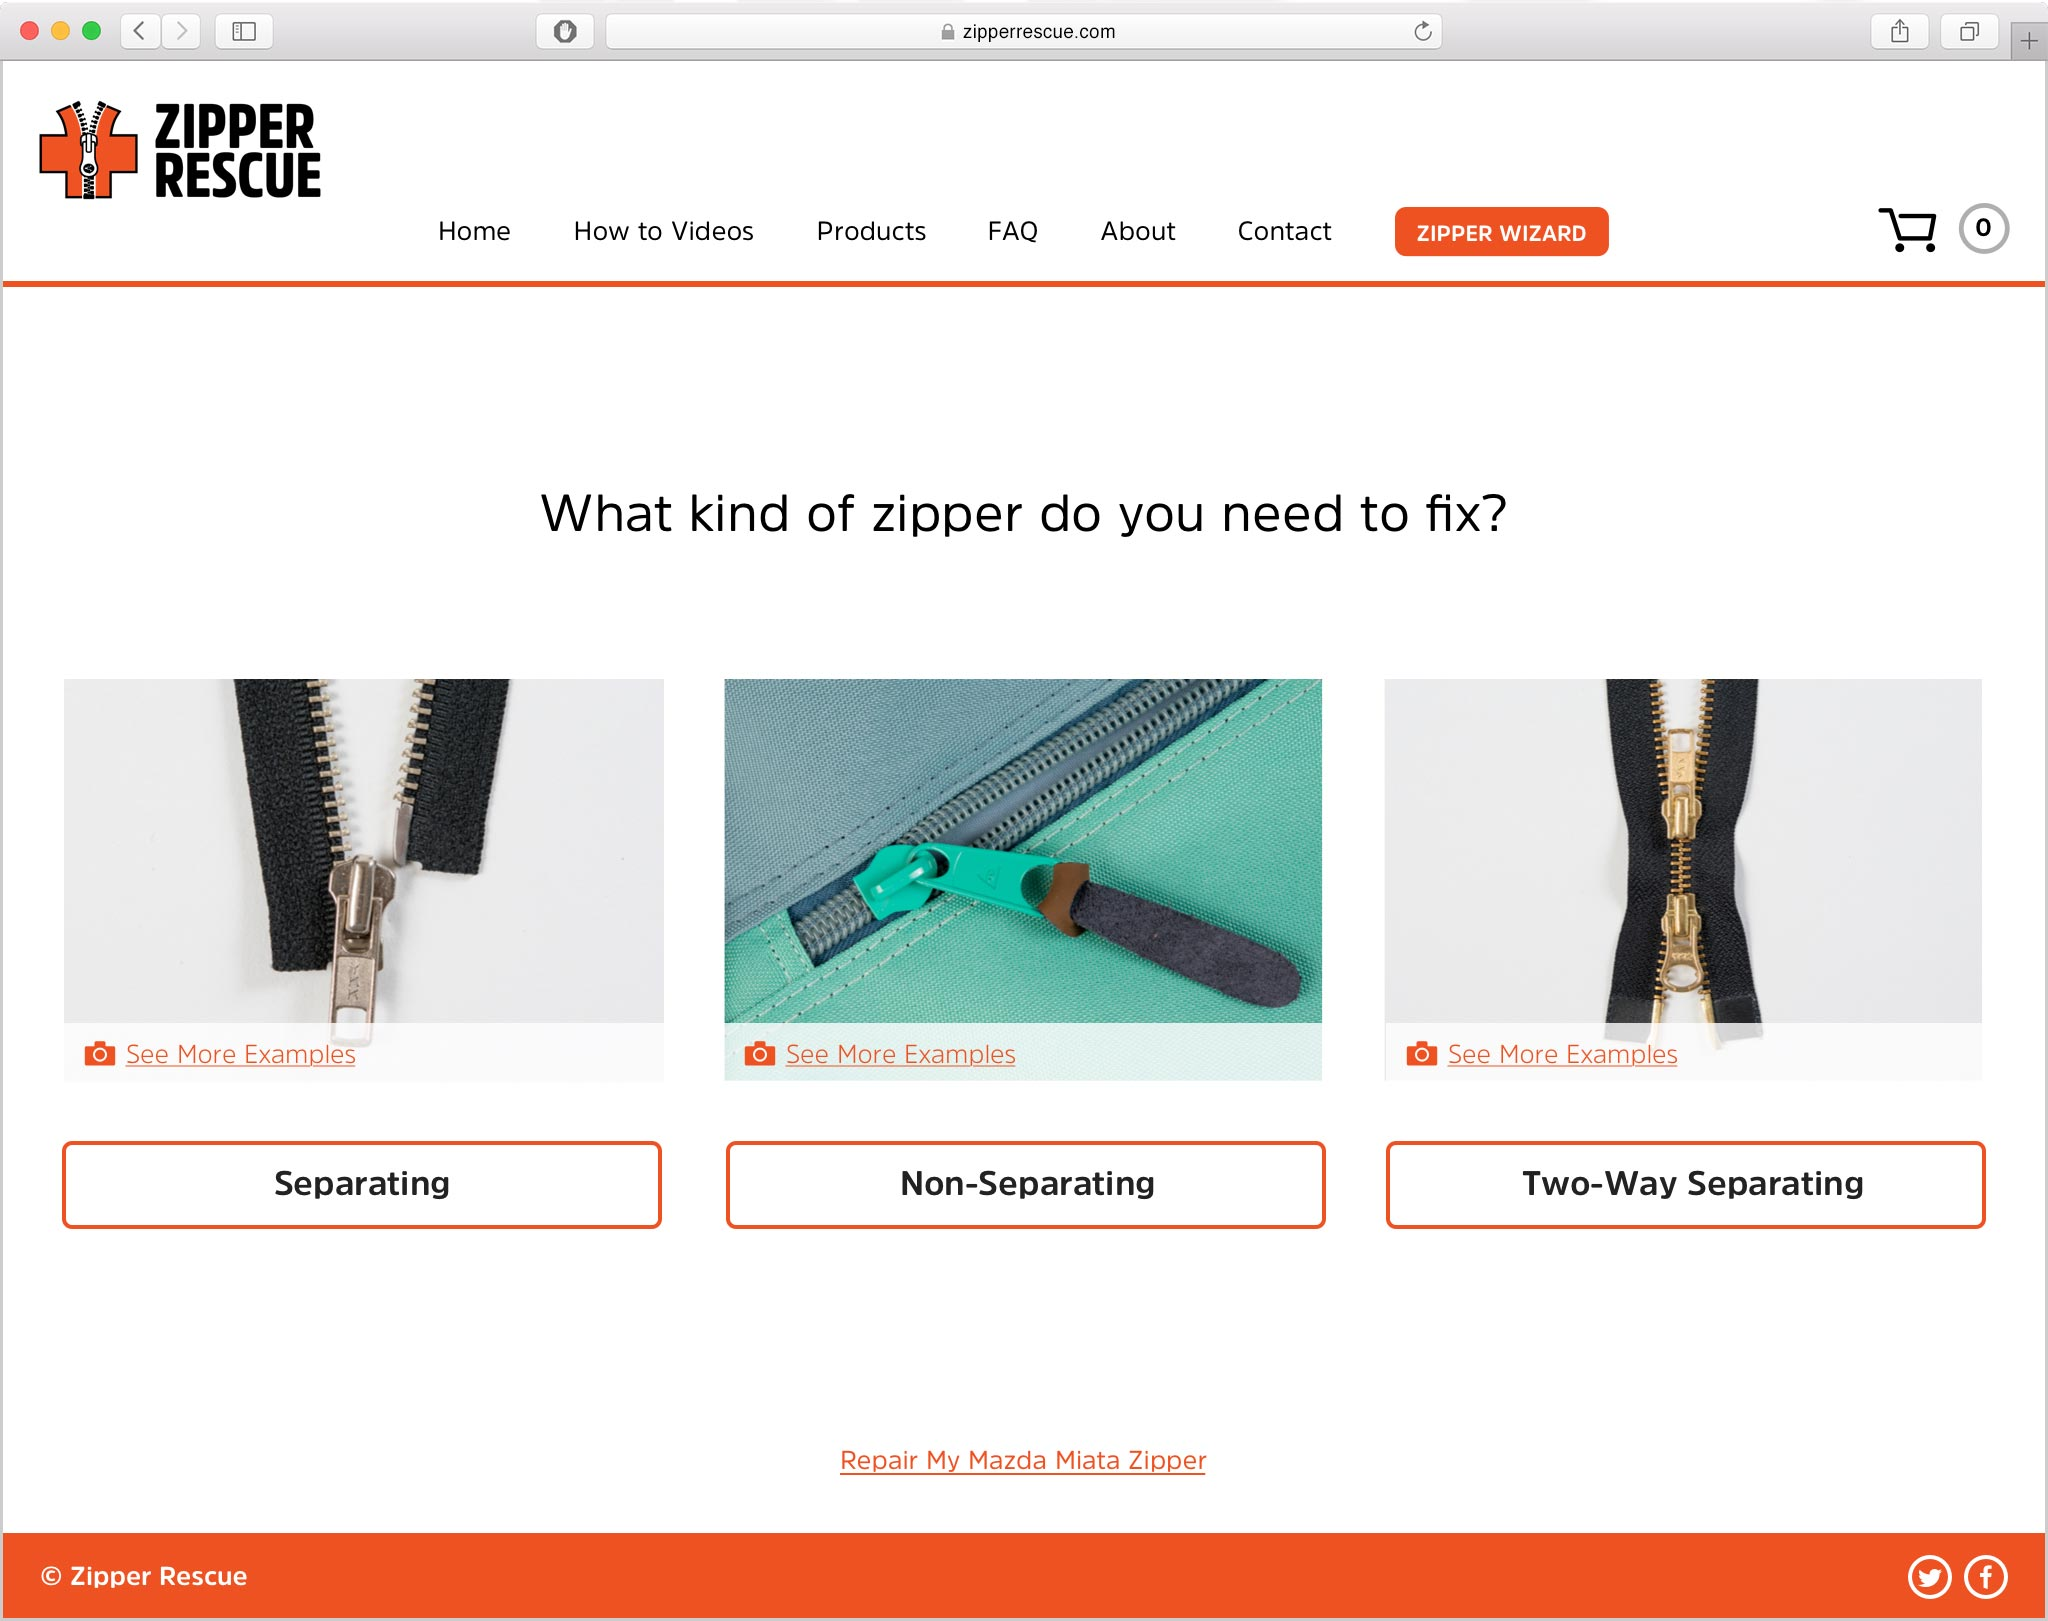 Portfolio_2017_Design_Zipper_Rescue_Website_Diagnostic_2048.jpg